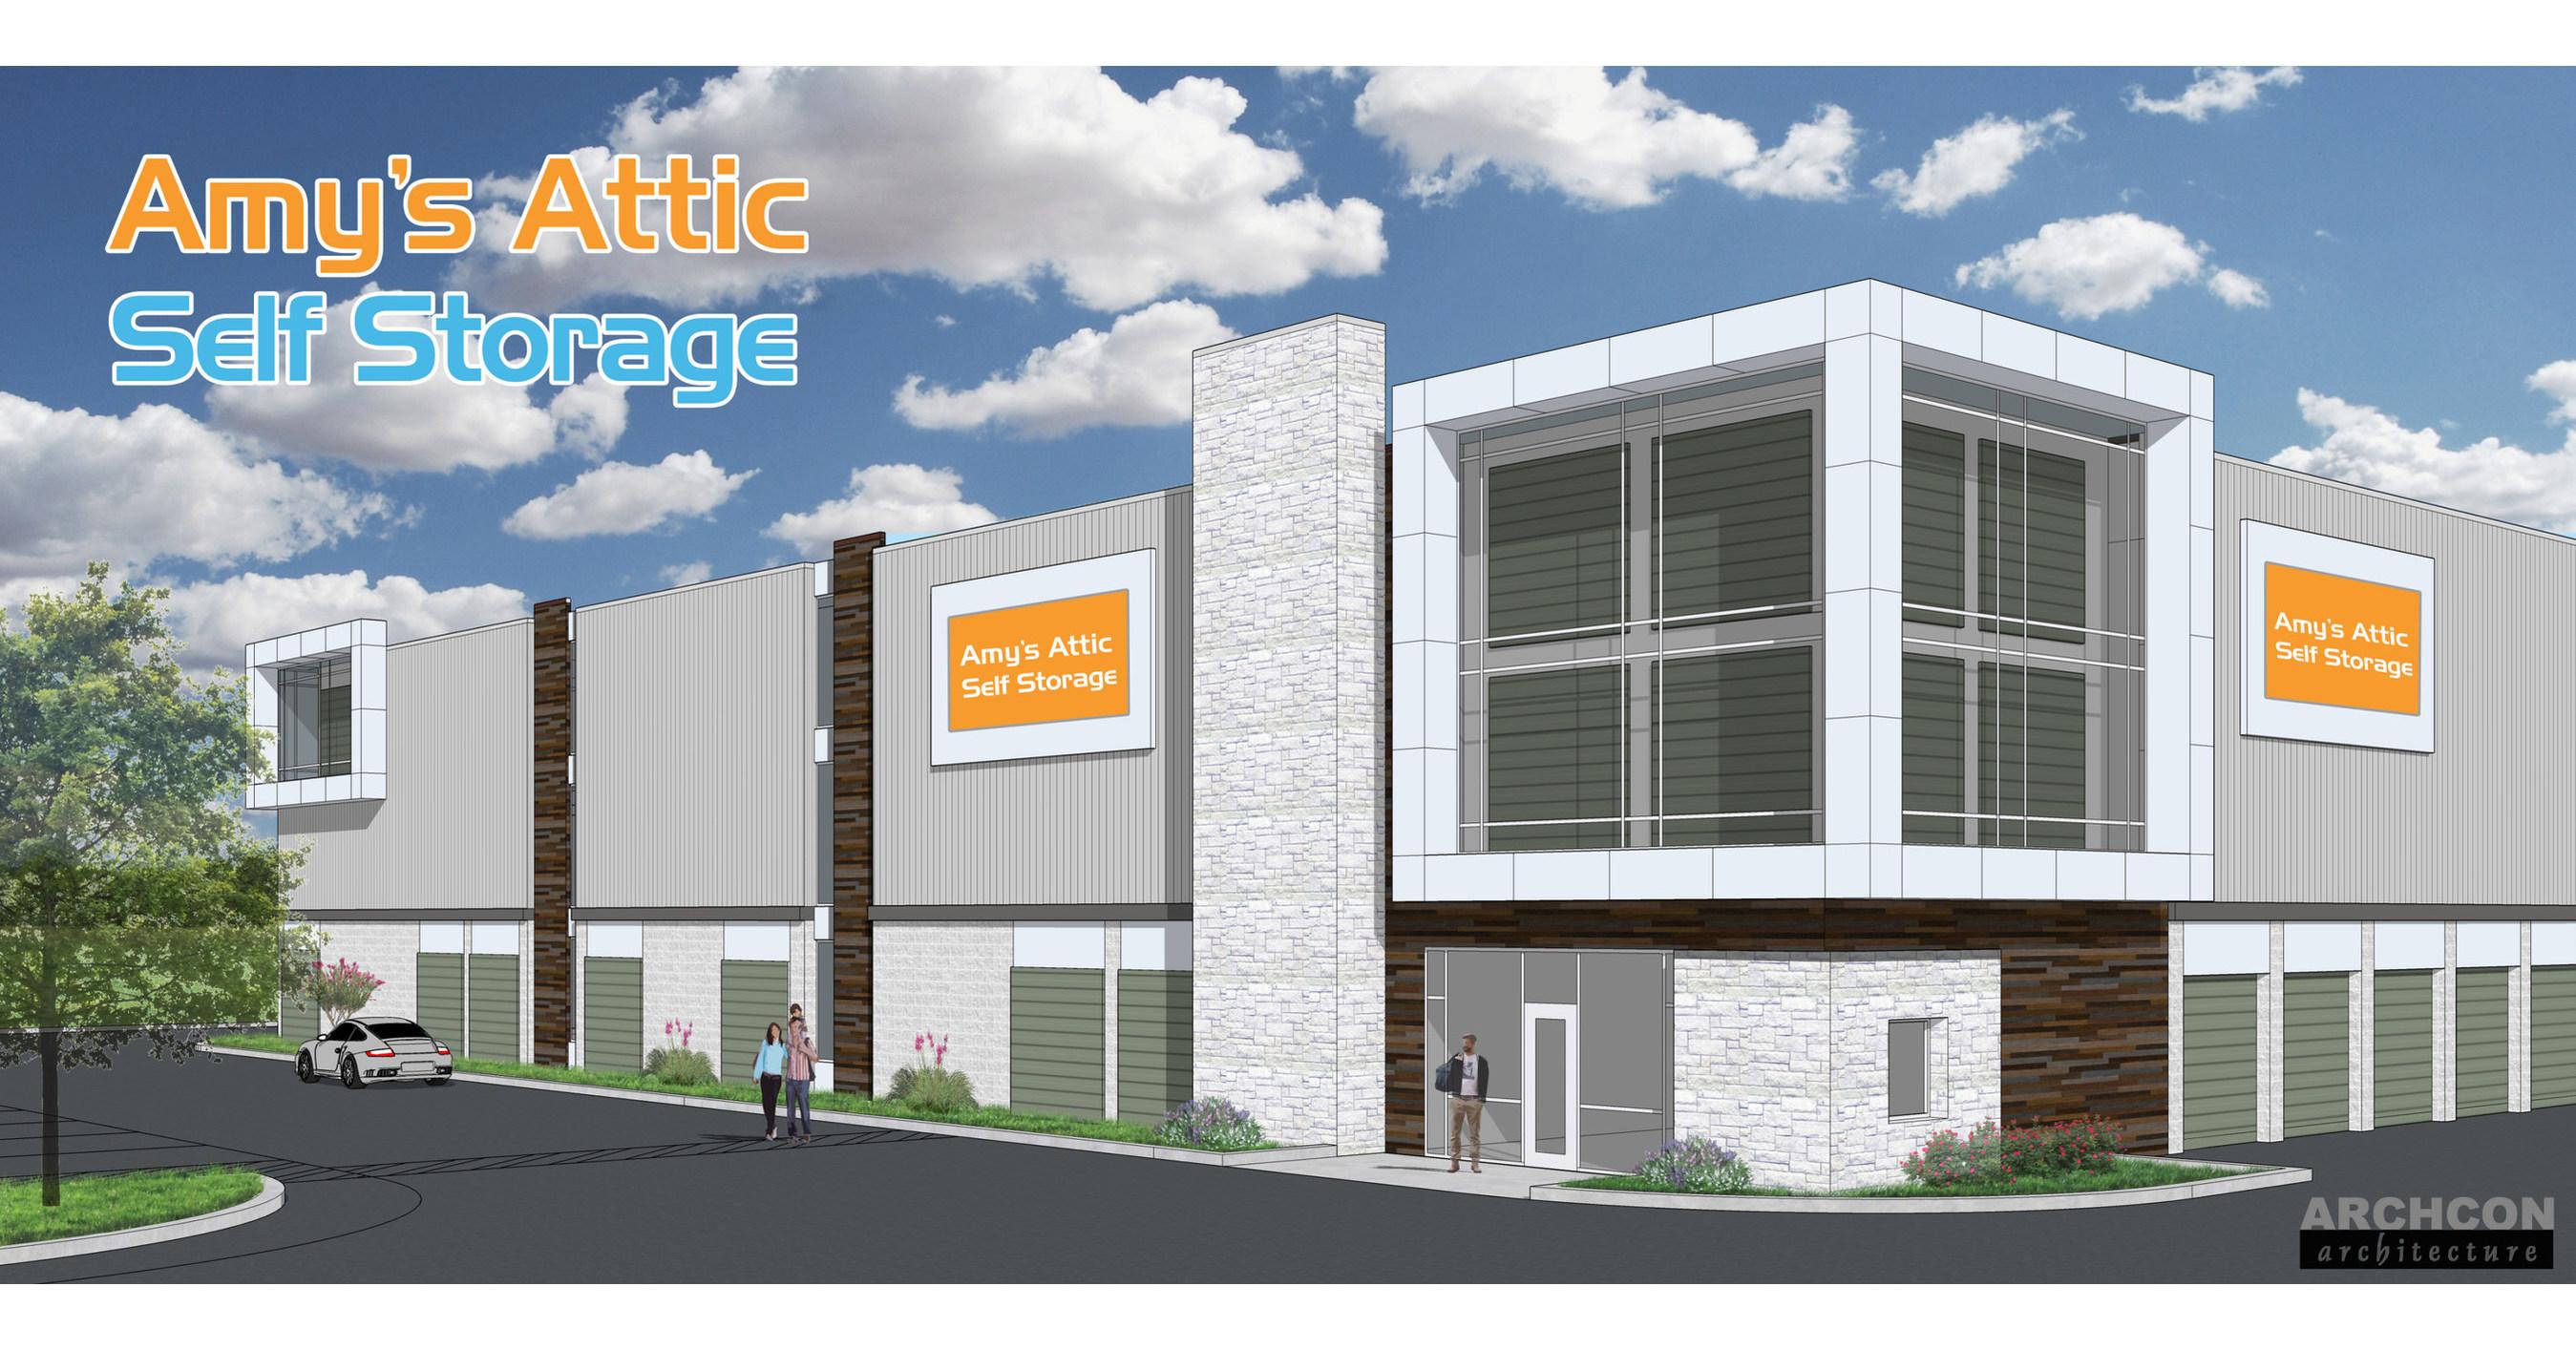 Amy's Attic Self Storage to Open New Location in Waco, TX